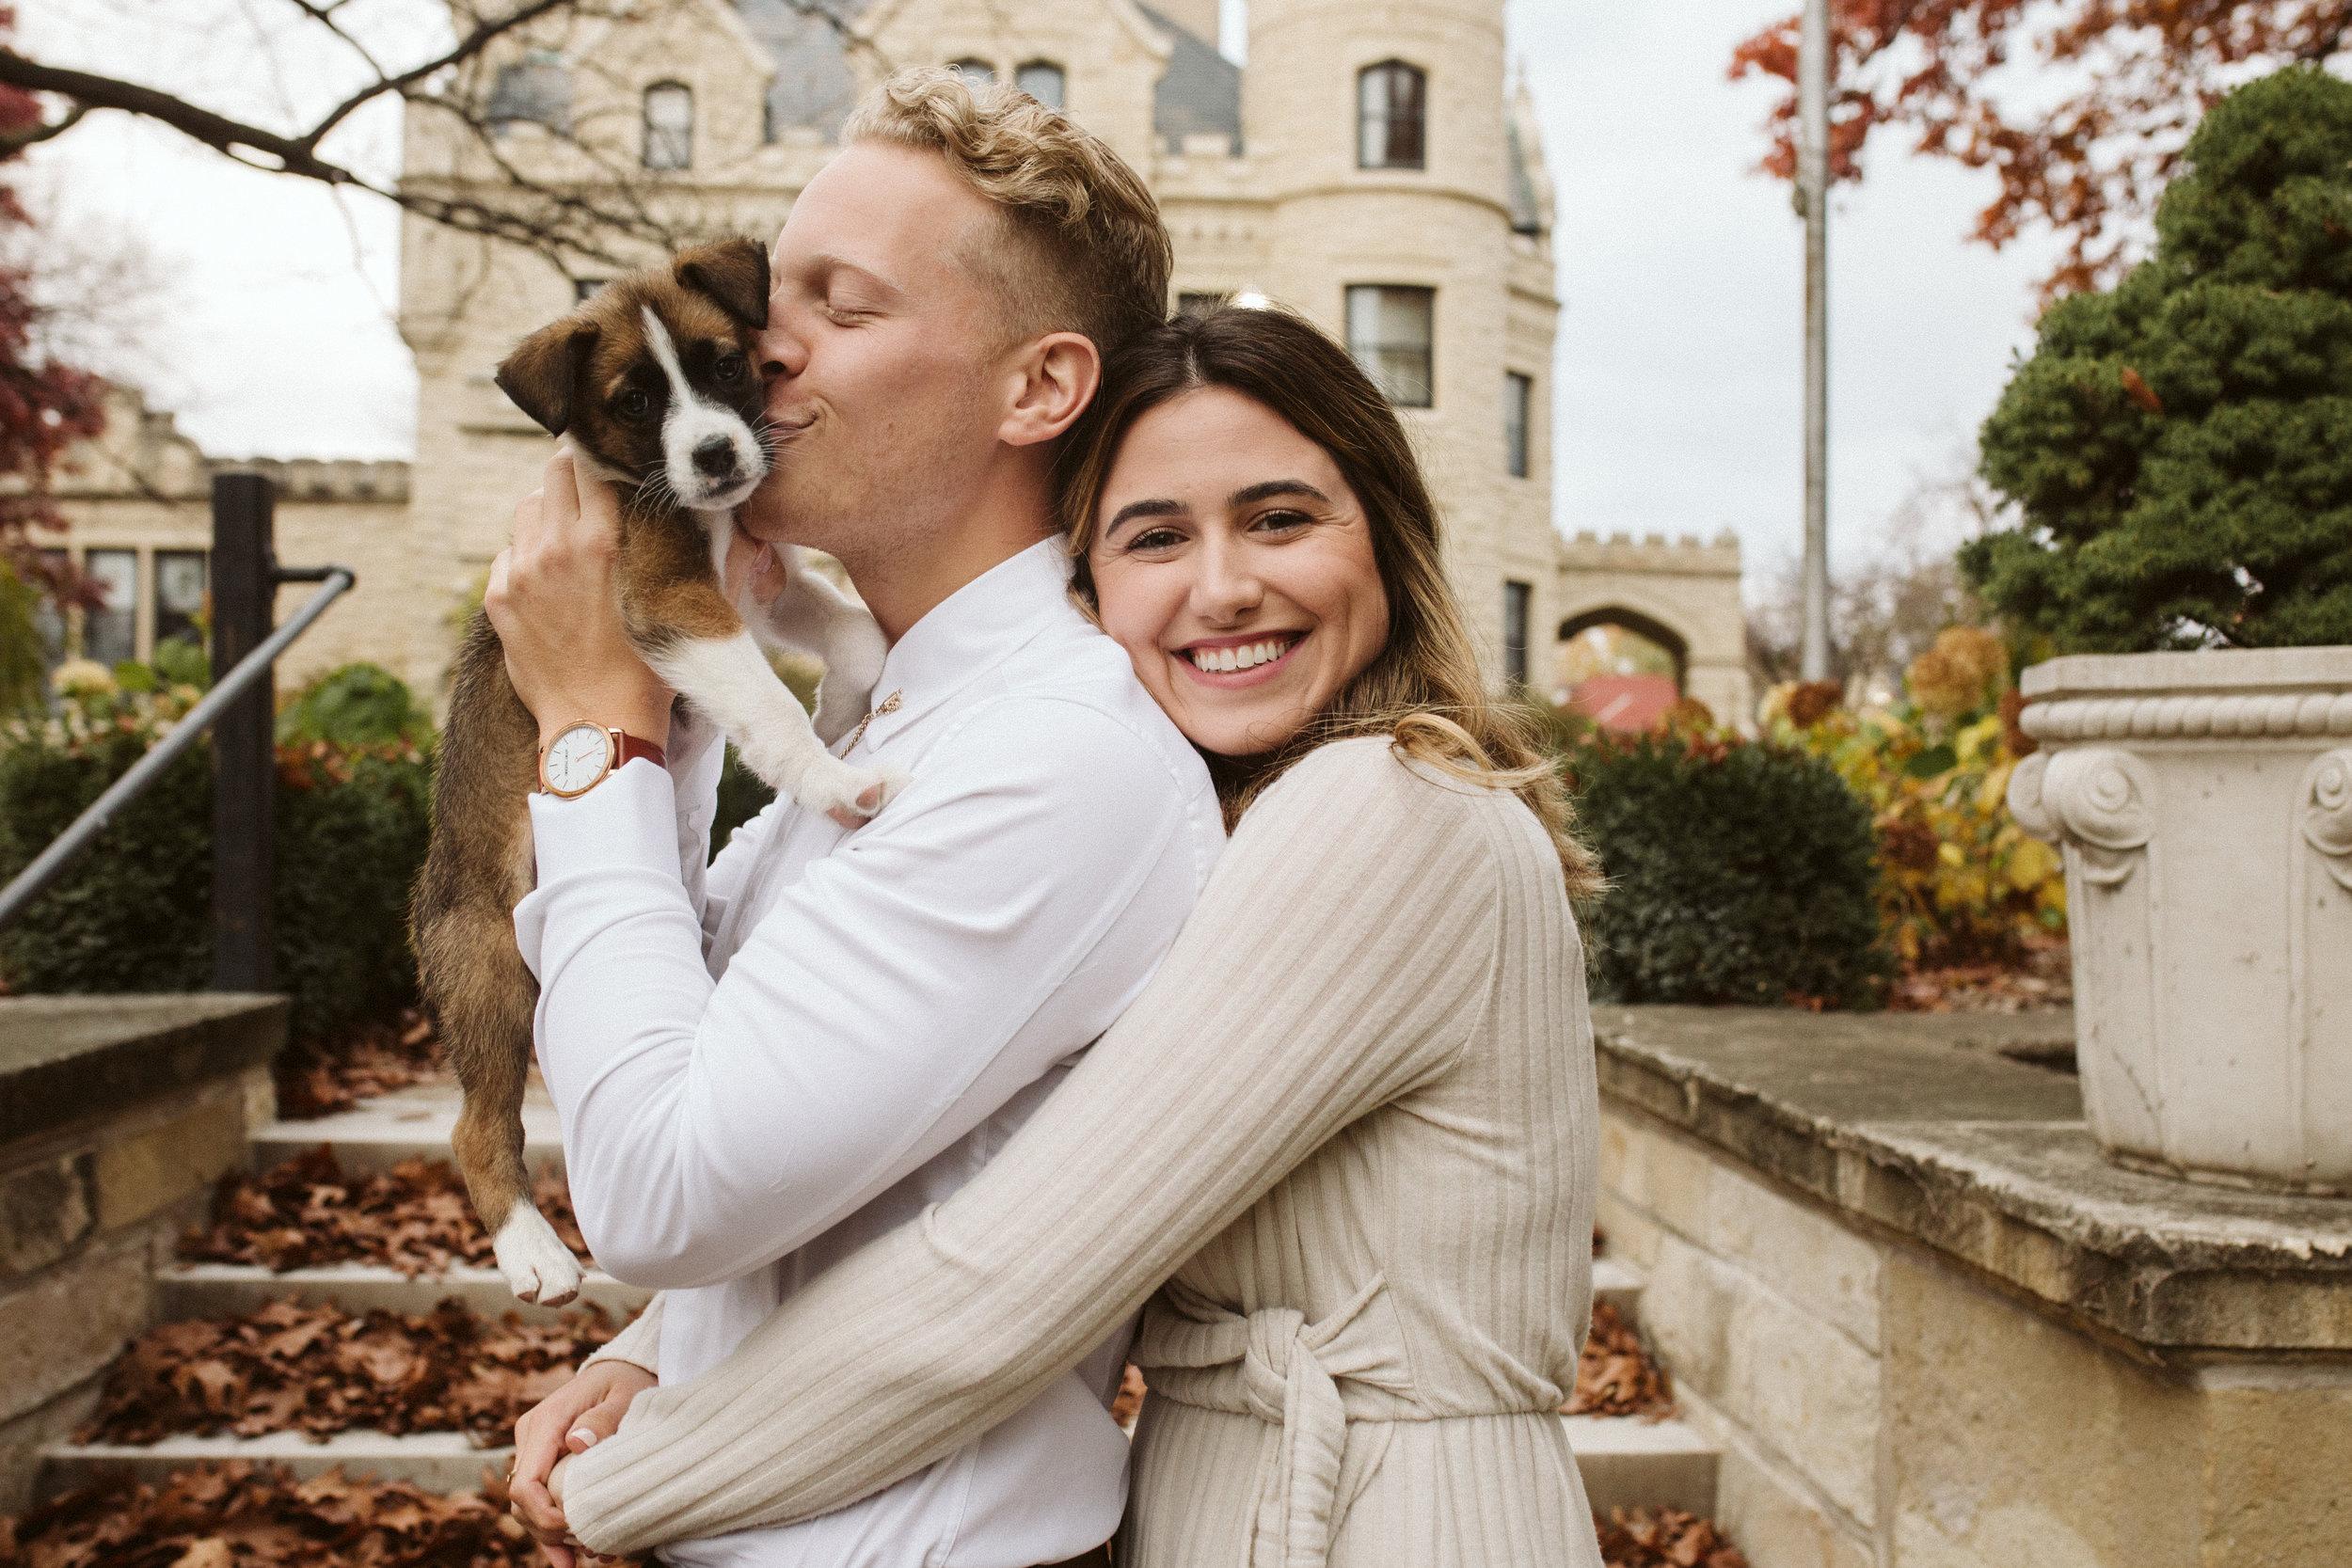 2018-11-02_Brett and Carlie_Wedding Eve_Kimberly Dovi Photography-0701.jpg